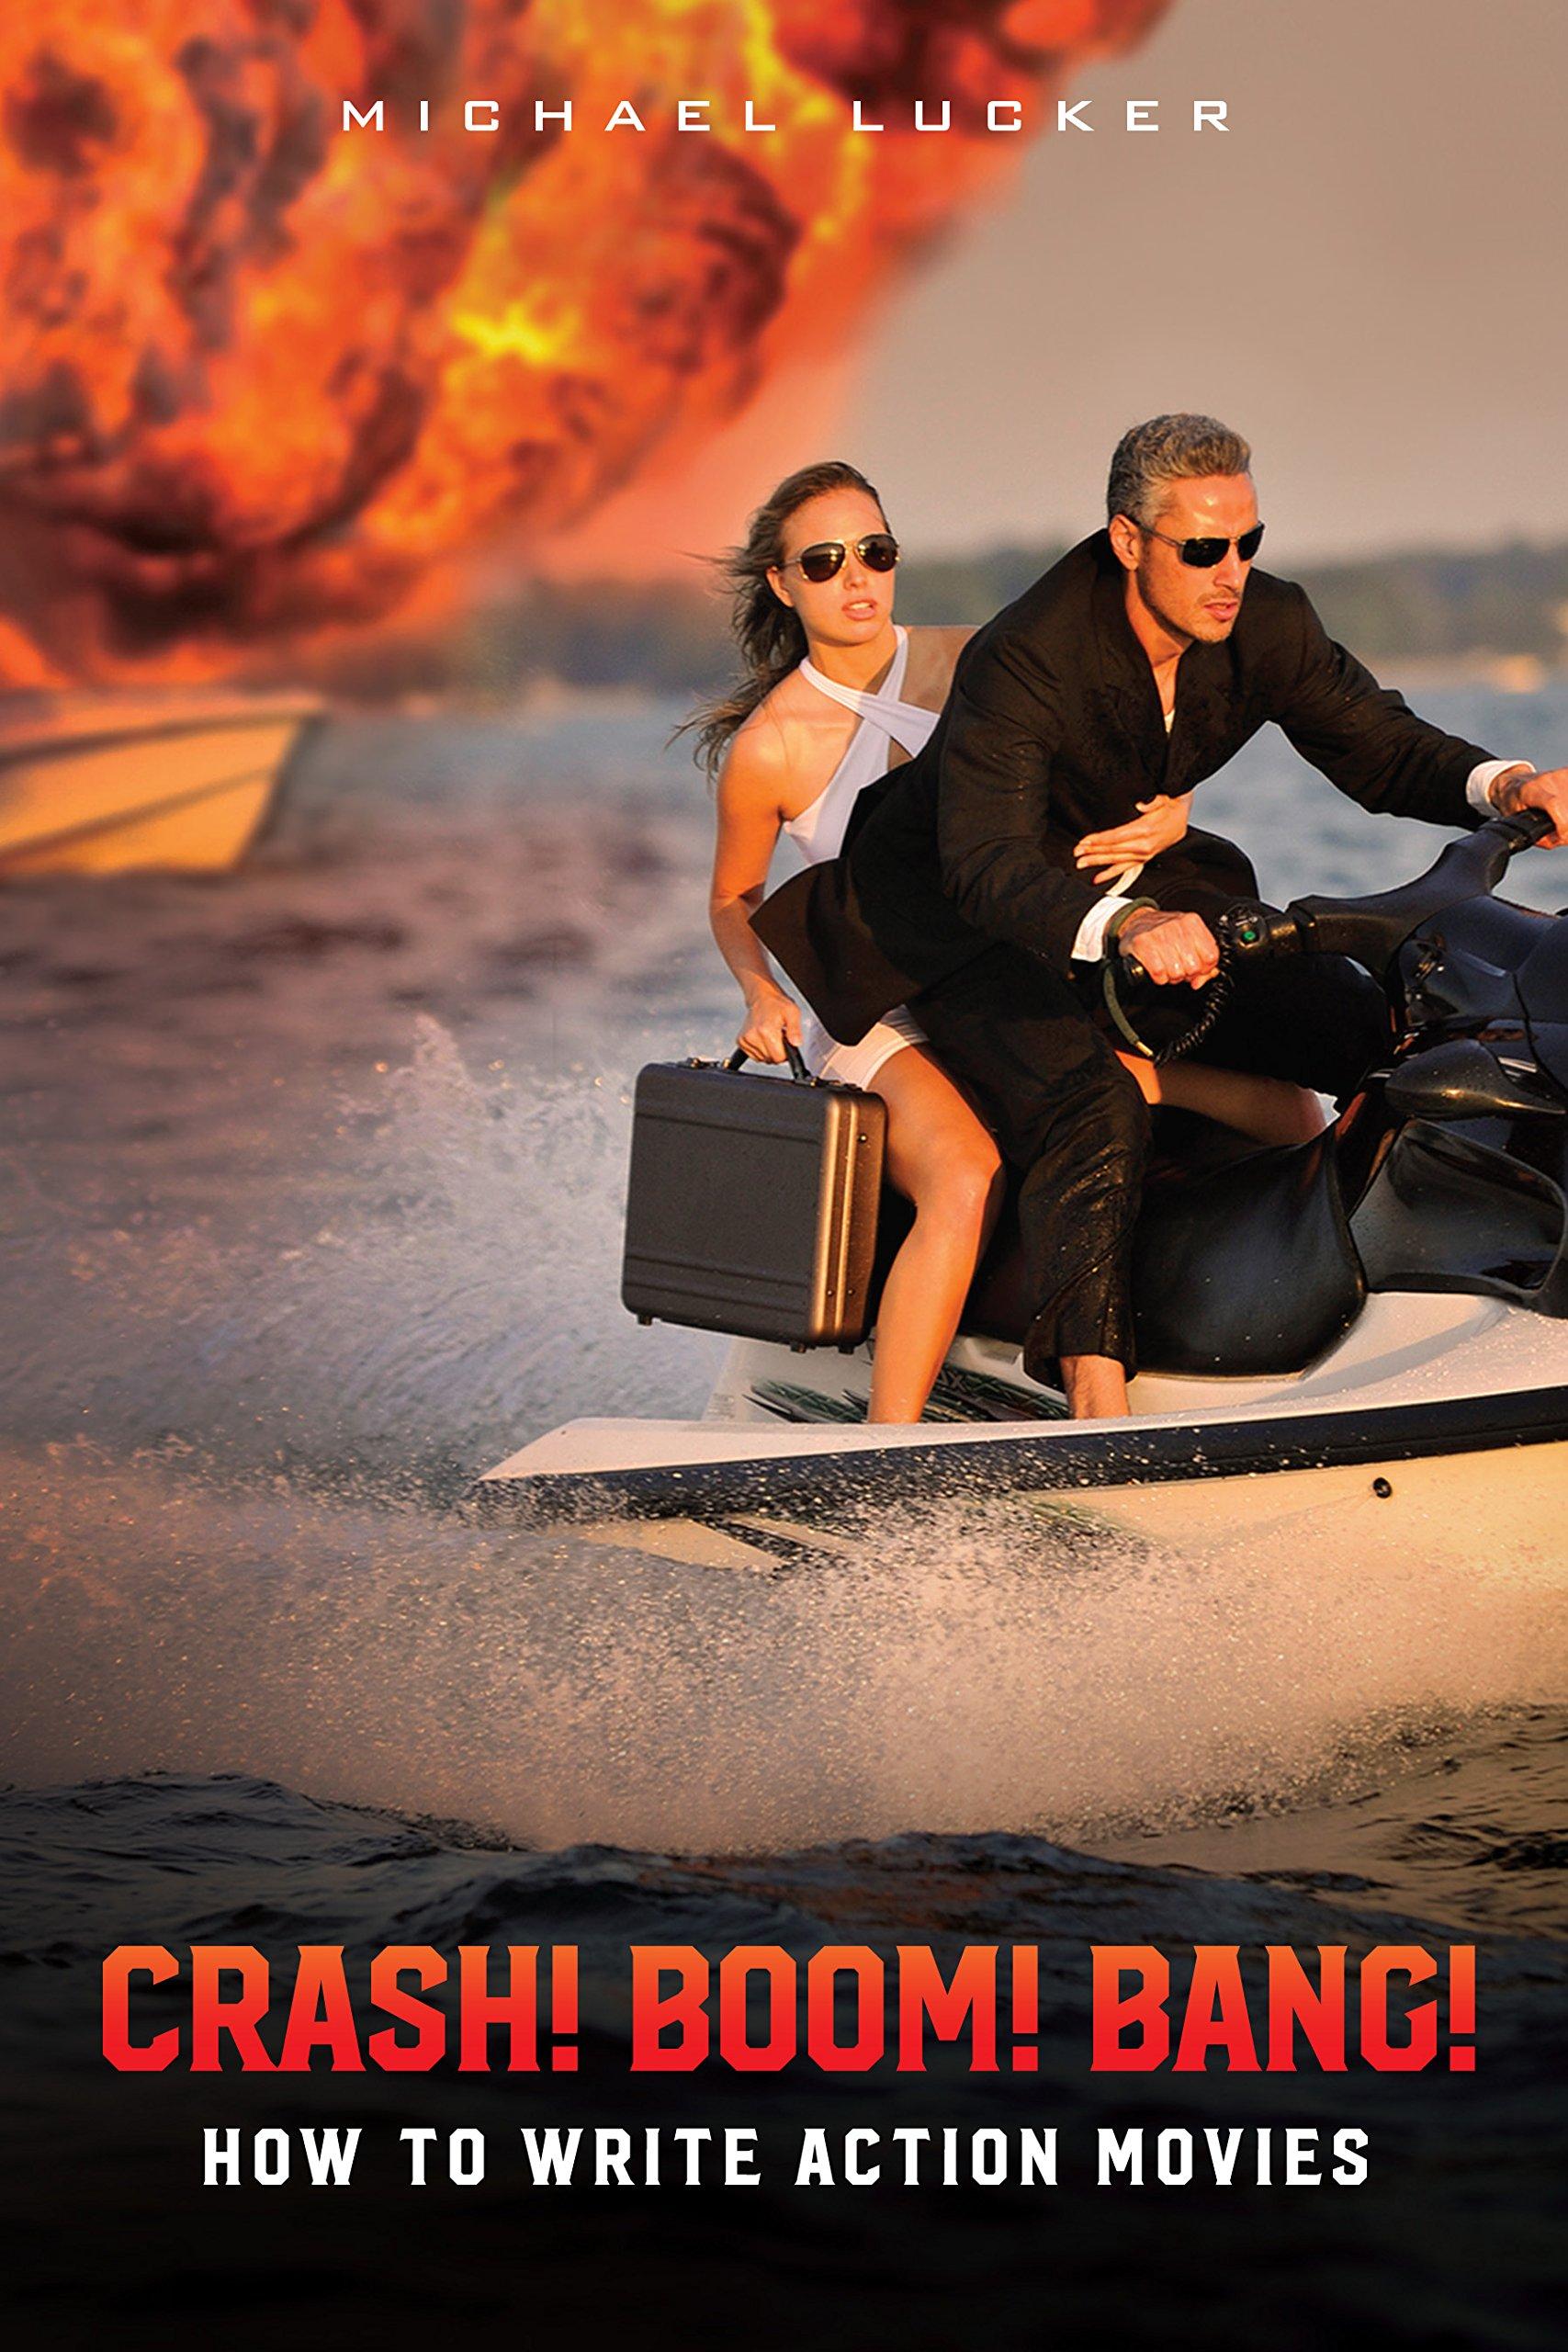 Download CRASH! BOOM! BANG! How to Write Action Movies ebook